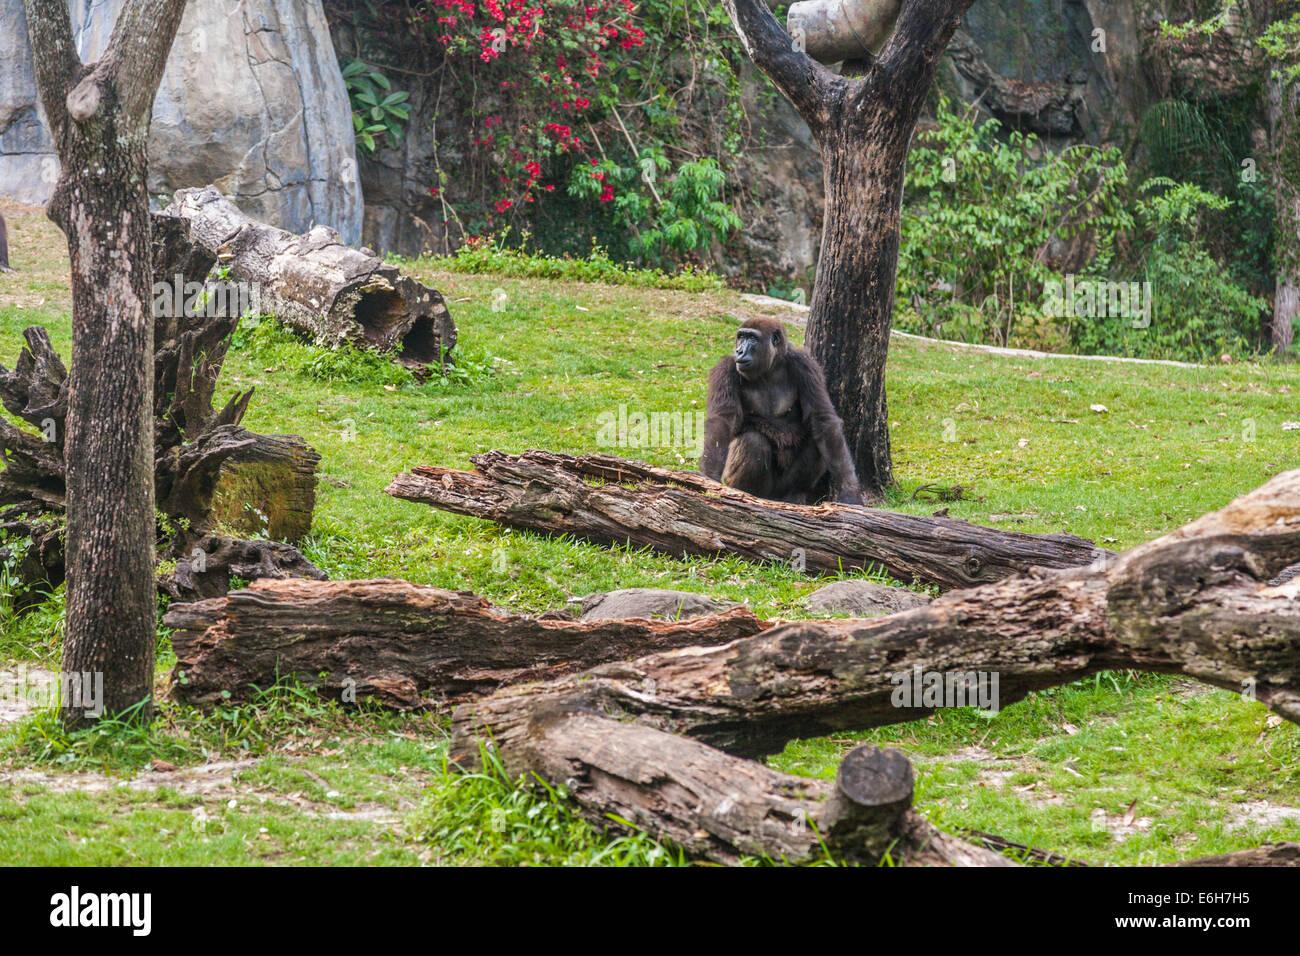 Gorilla in natural habitat at Busch Gardens in Tampa, Florida - Stock Image